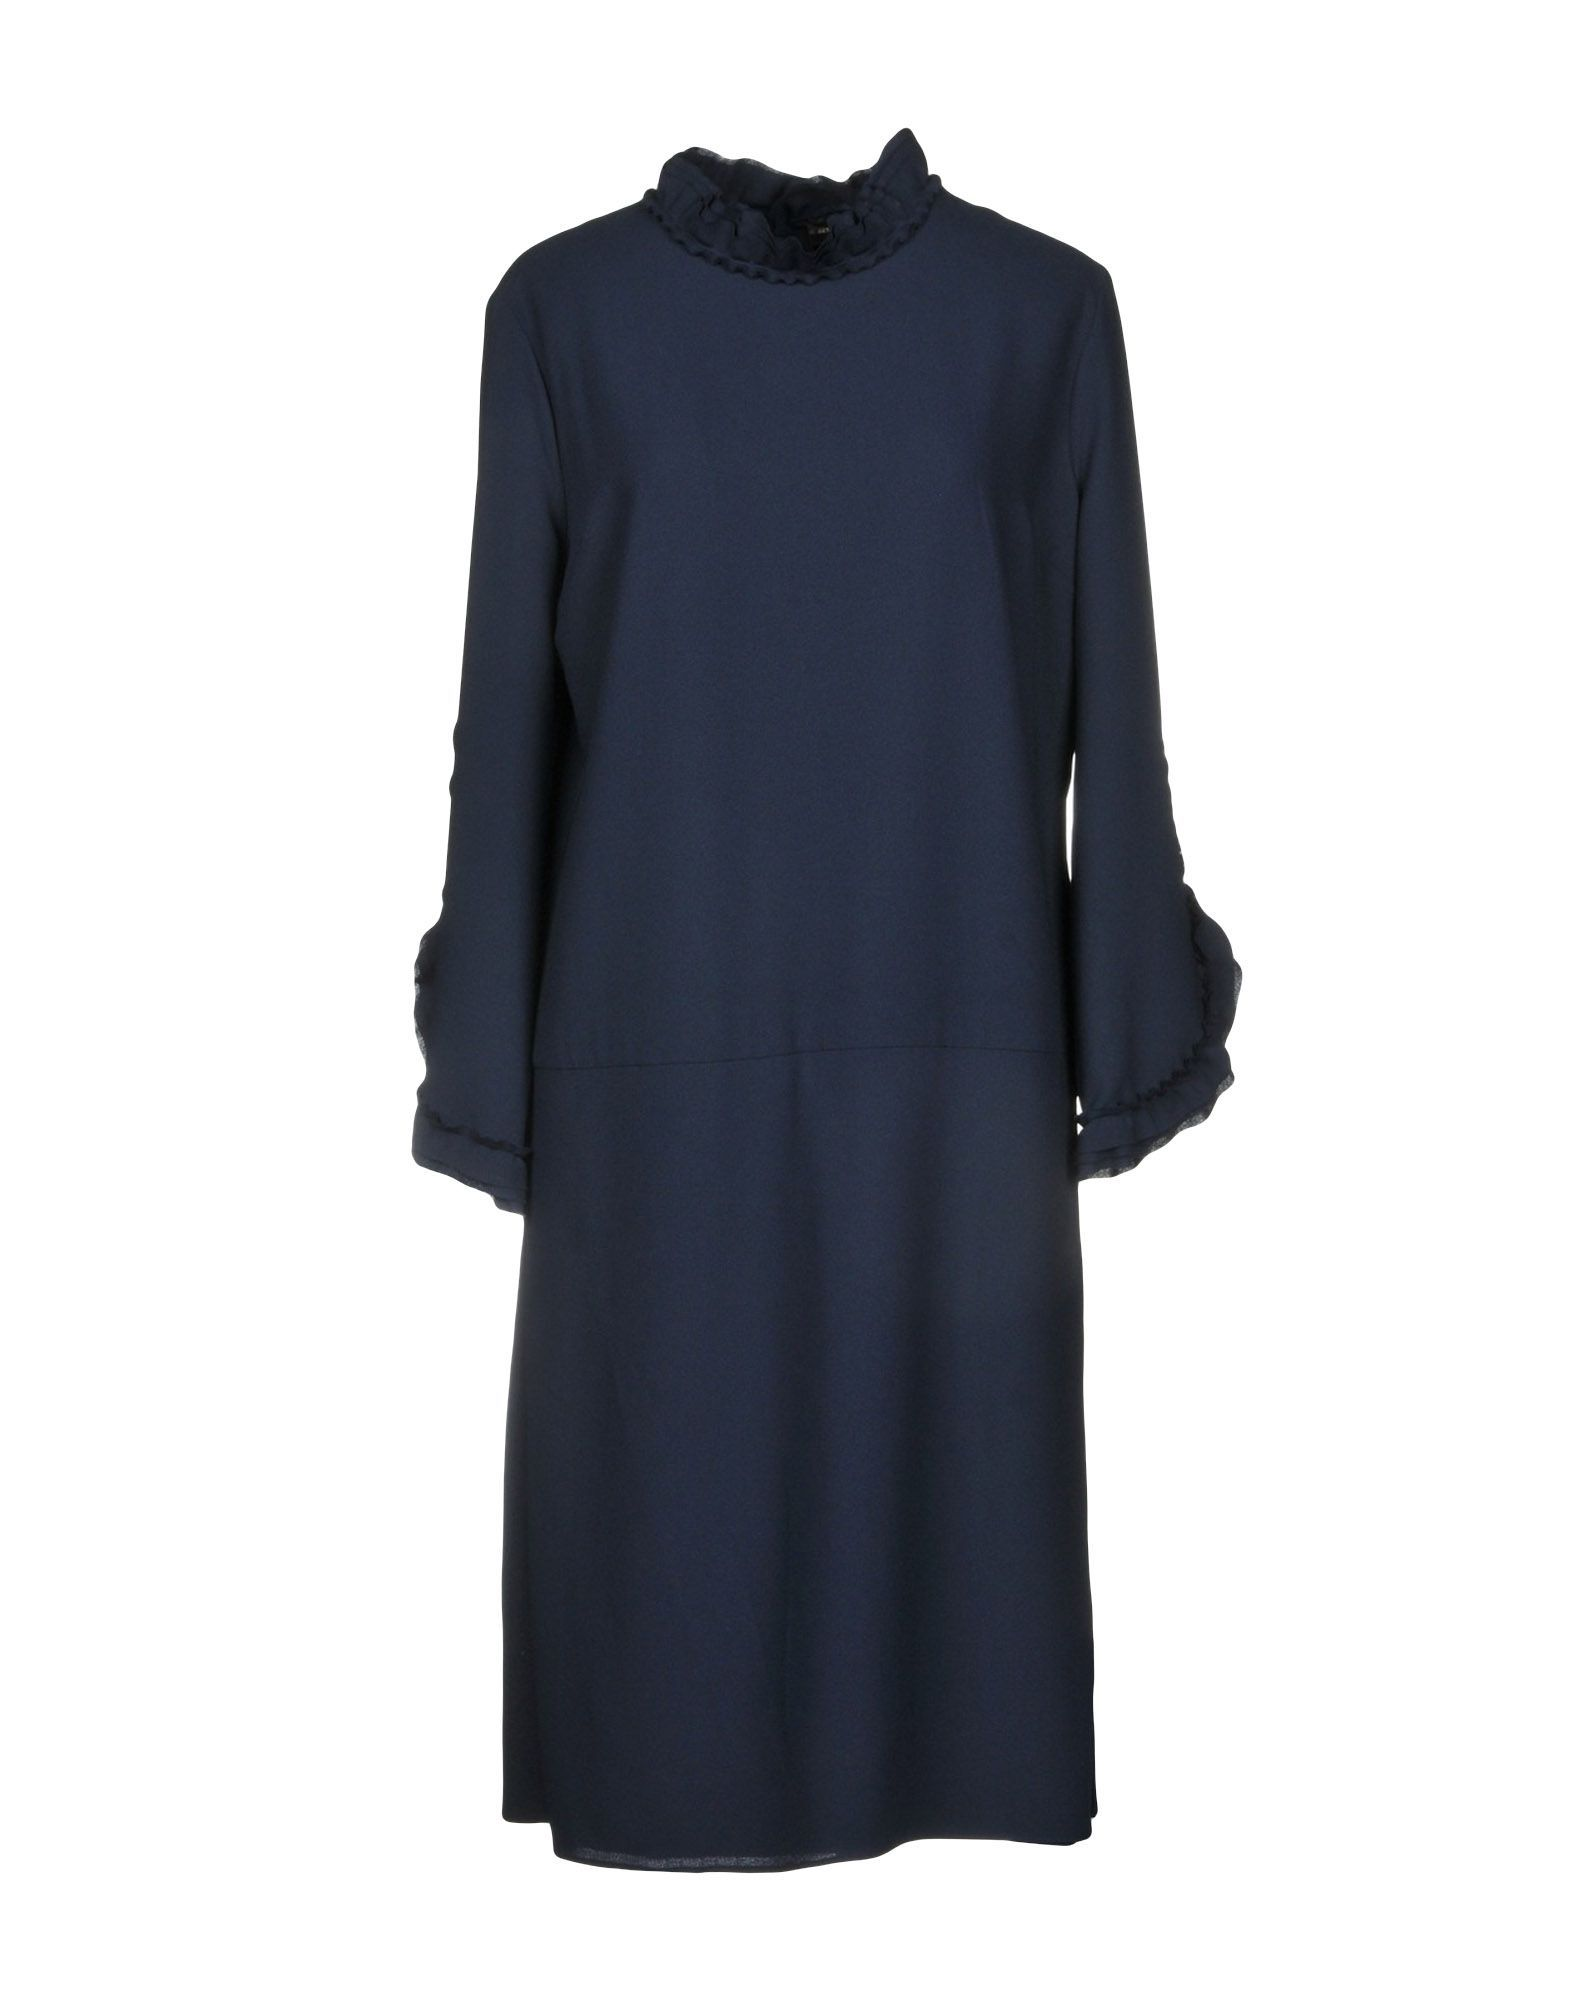 Alessandro Dell'Acqua Dark Blue Long Sleeve Dress